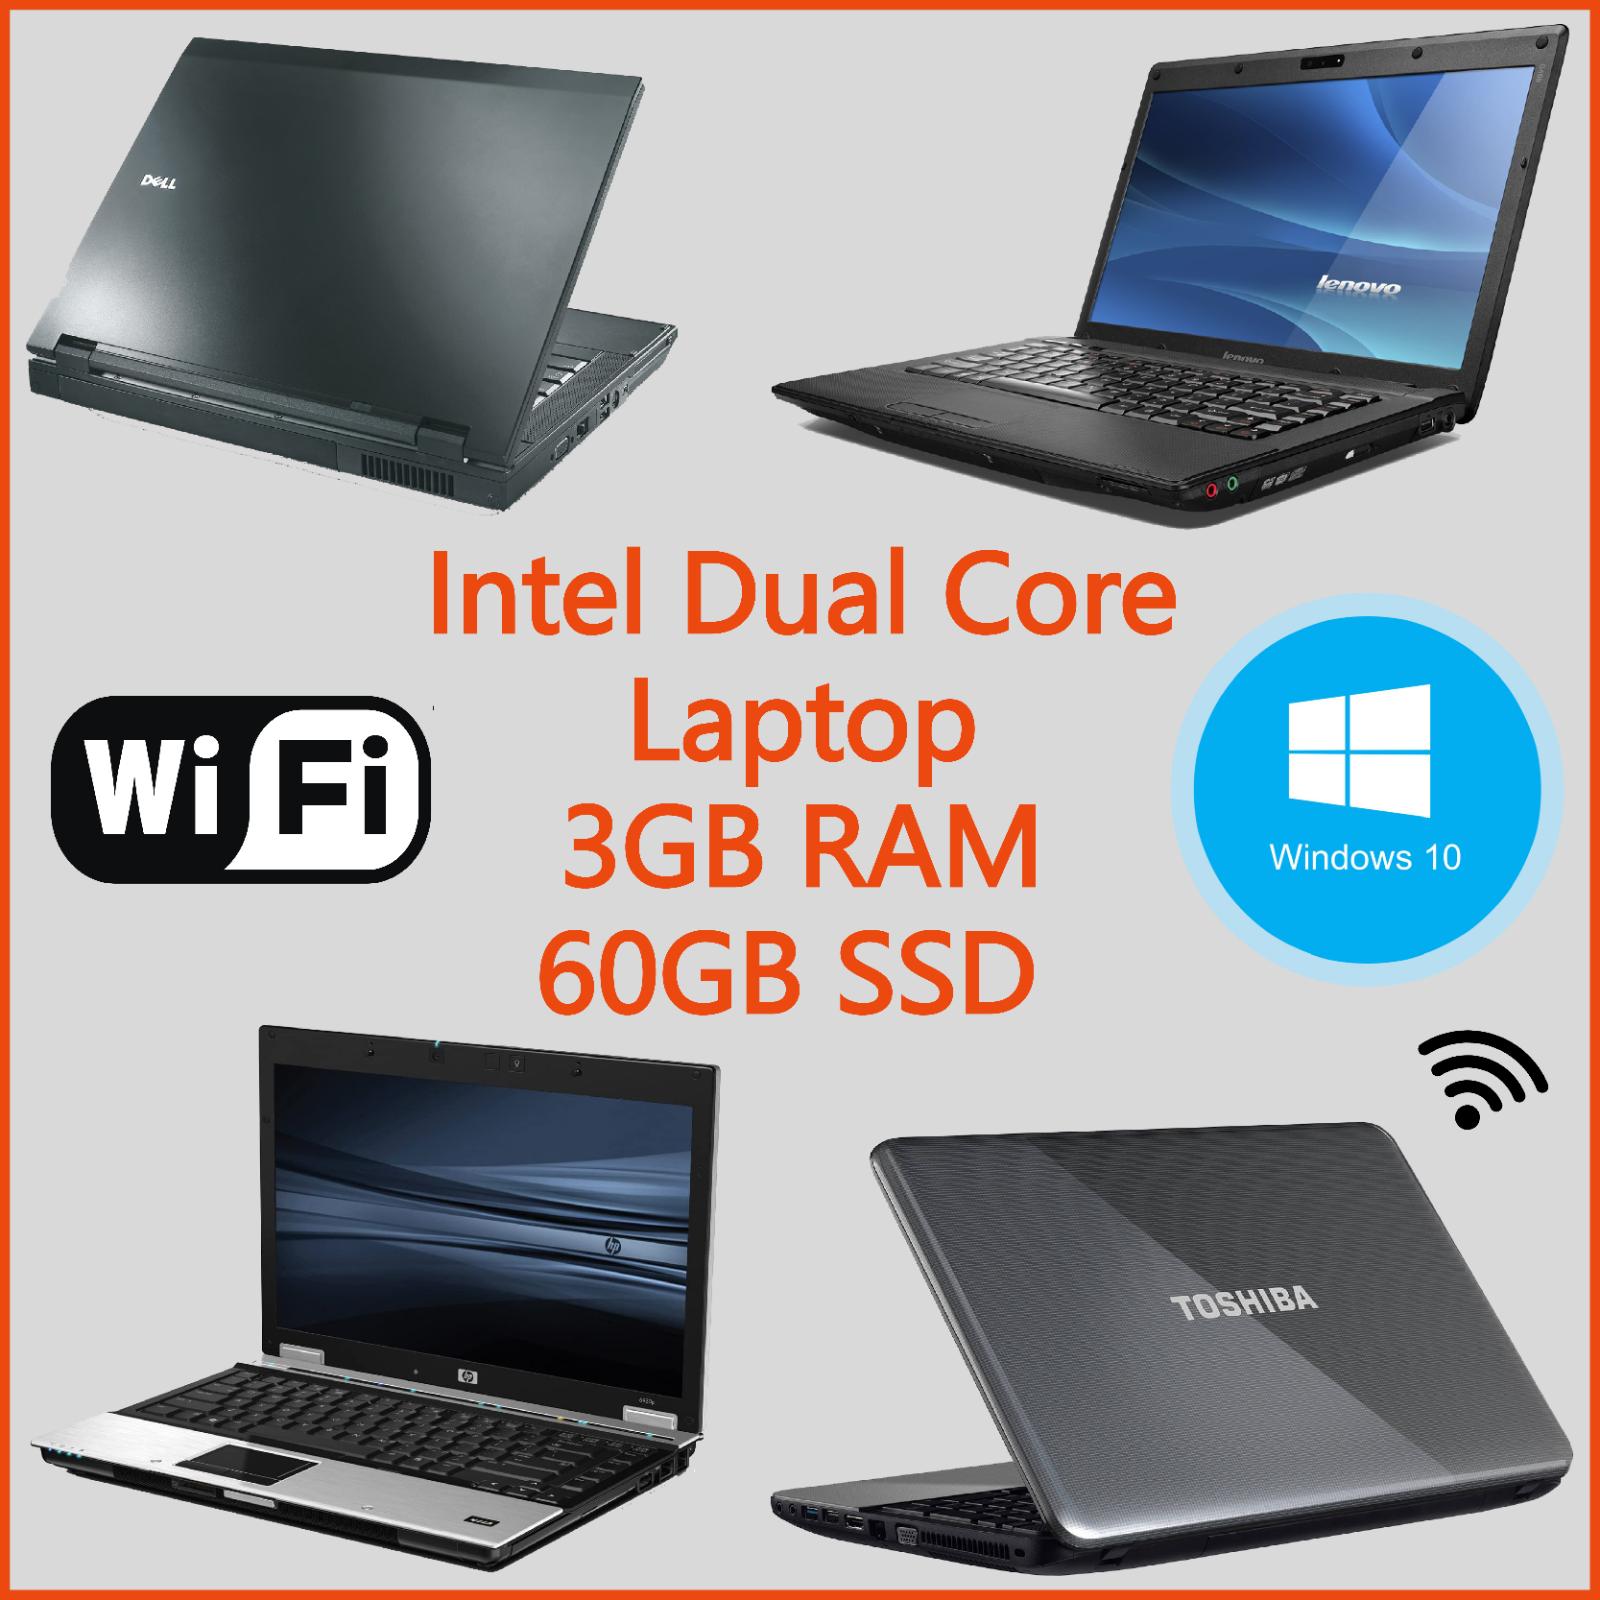 Laptop Windows - CHEAP FAST WINDOWS 10 LAPTOP INTEL DUAL CORE 60GB SSD 3GB RAM